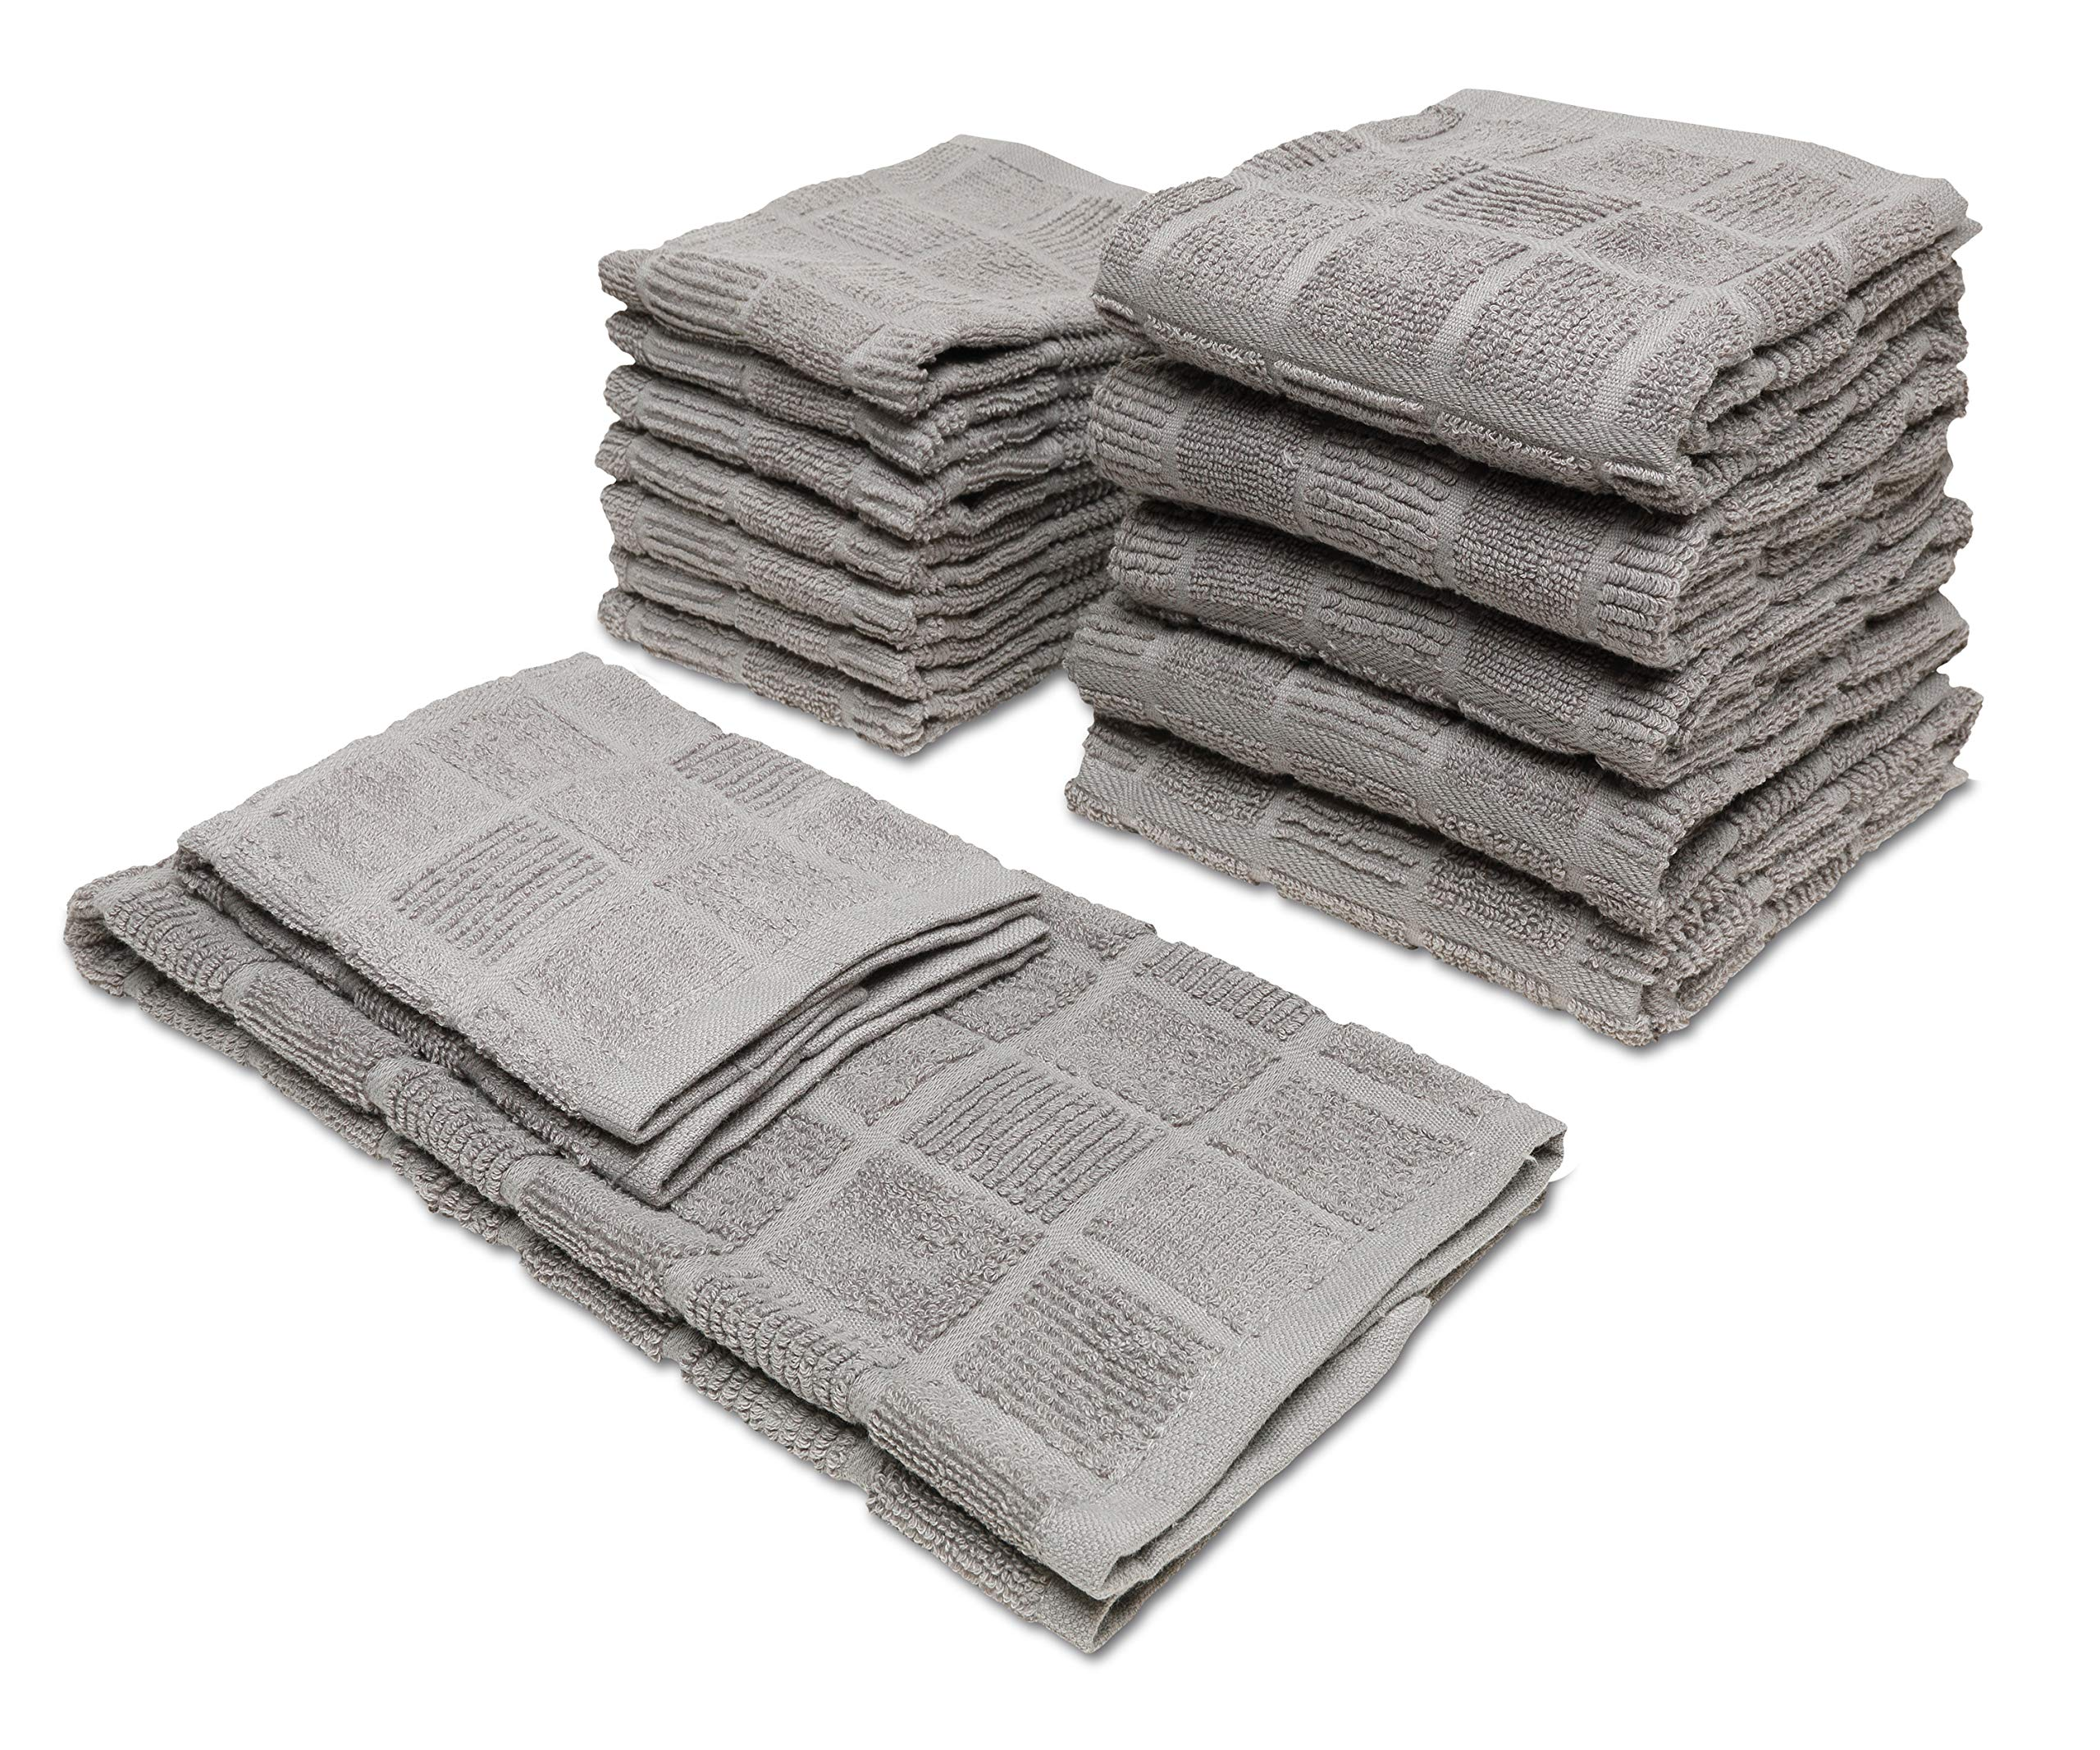 Popular Home 934564 Aria Kitchen Towel, One Size, Steel-Grey